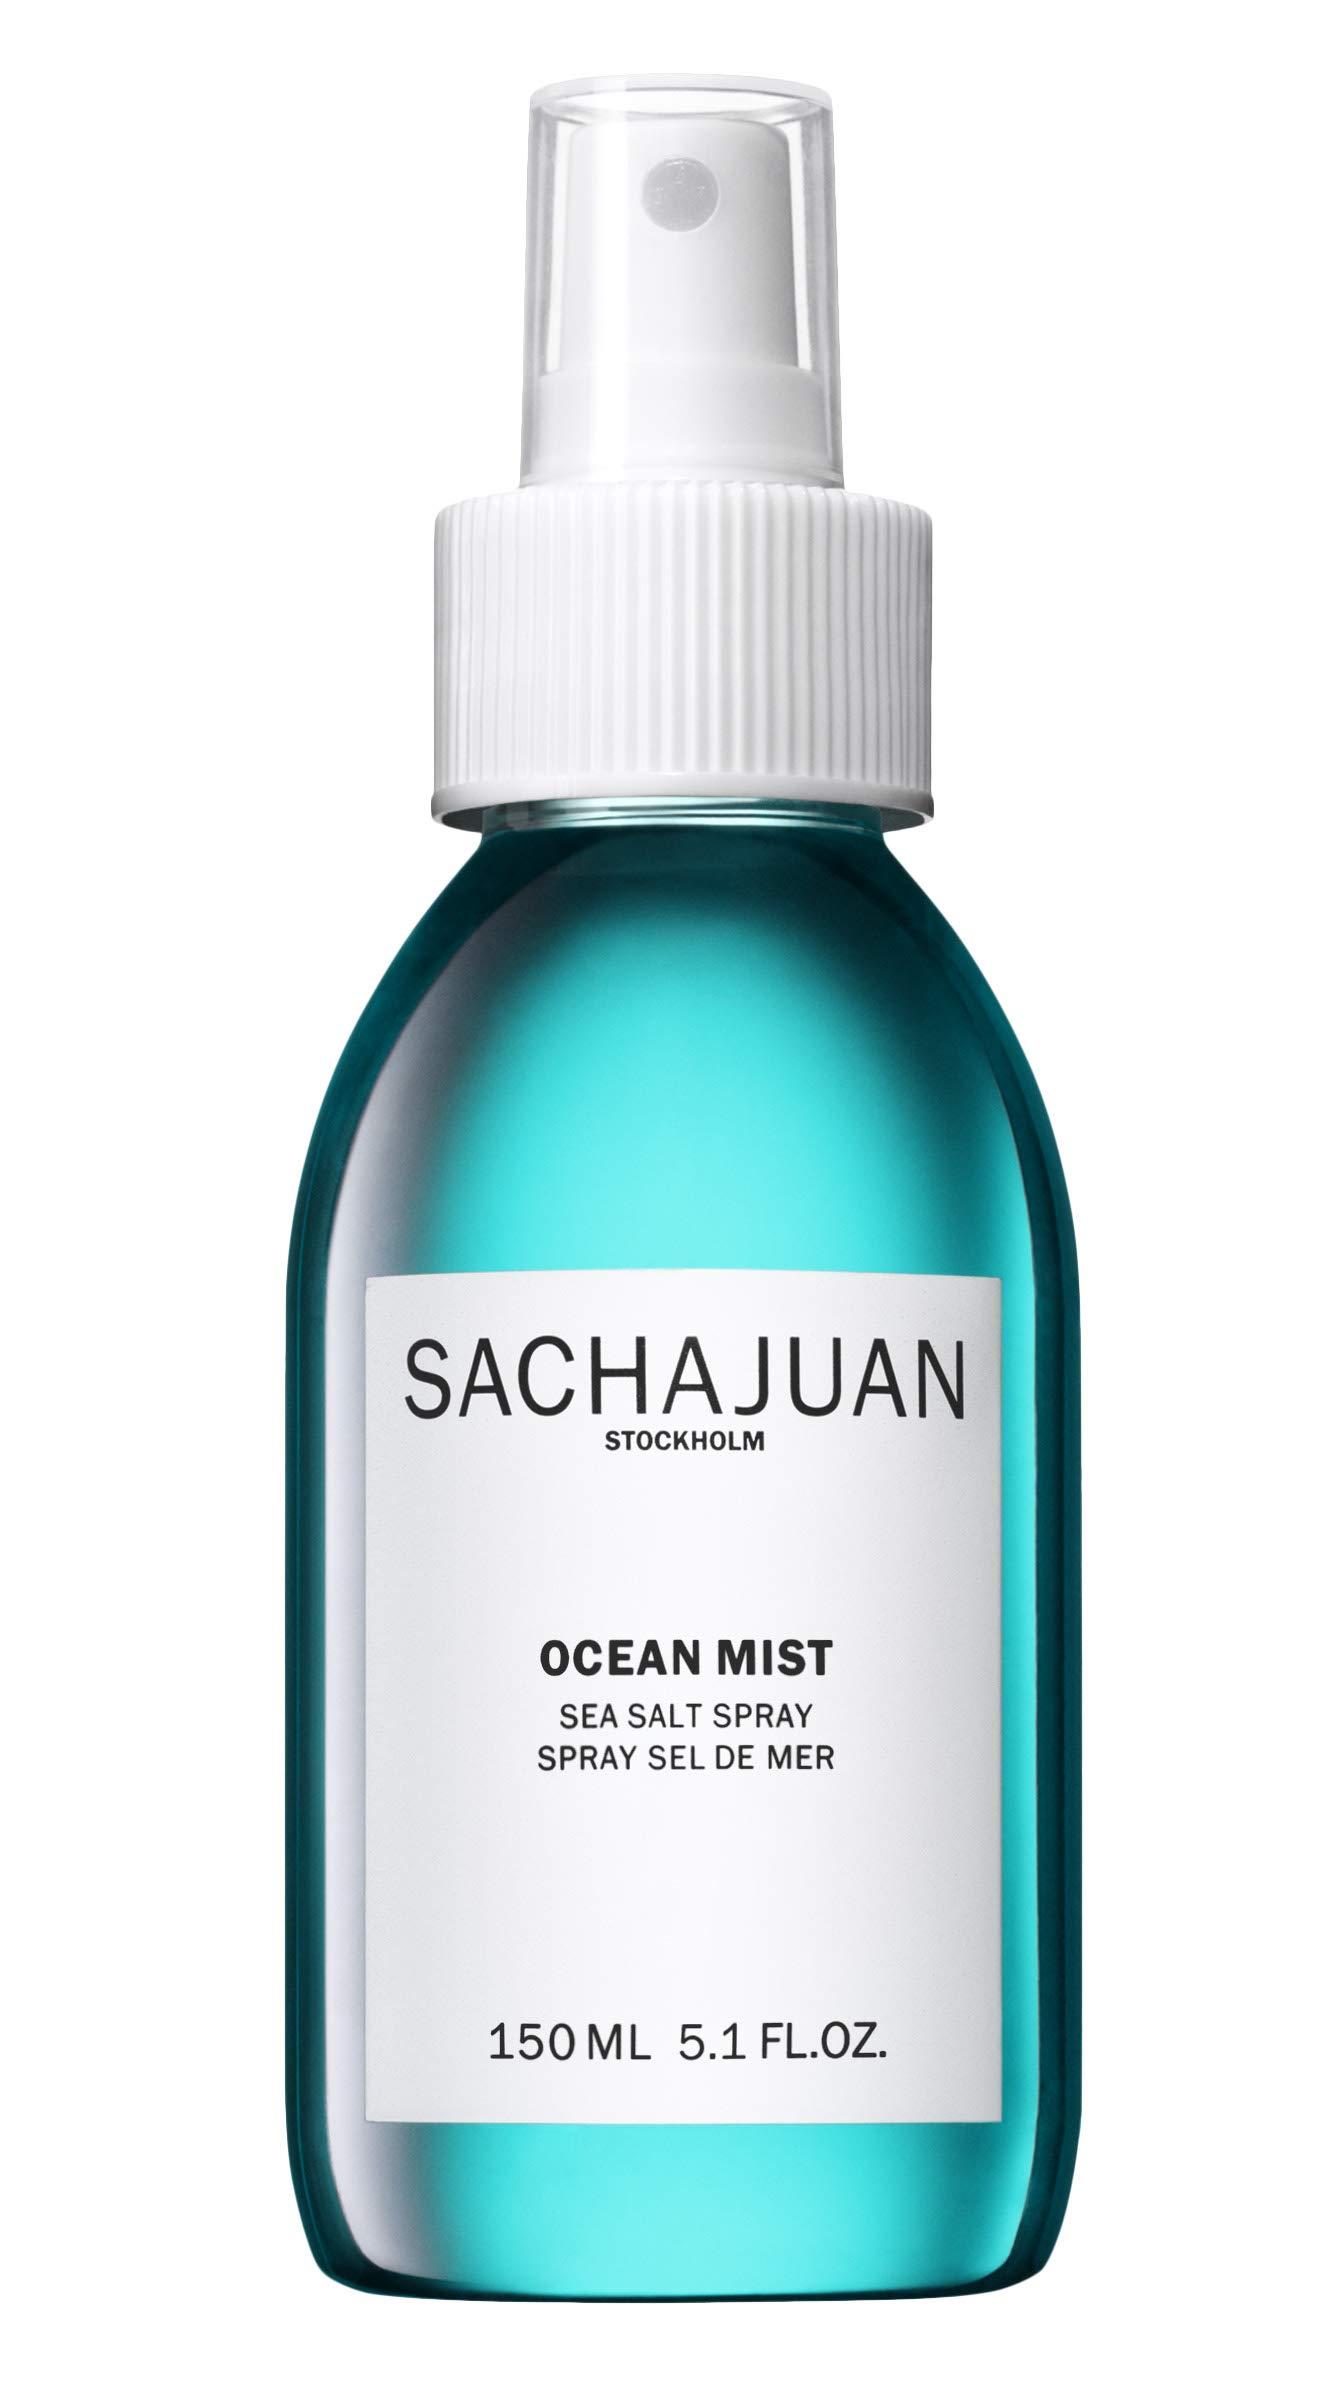 SACHAJUAN Ocean Mist 150 ml